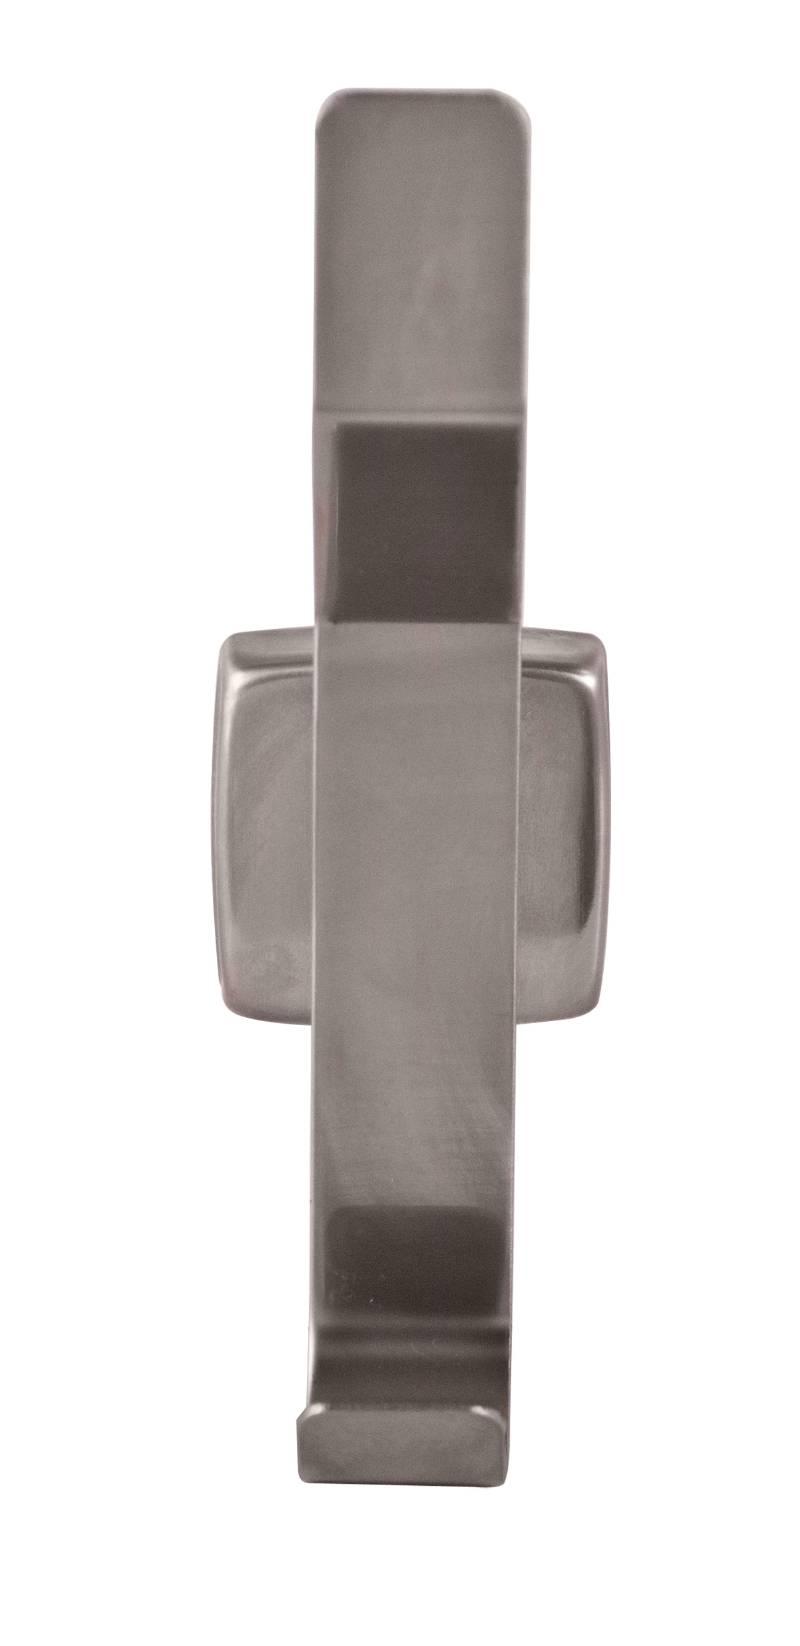 Bradley 9135 Bright Polished Stainless Steel Hat & Coat Hook